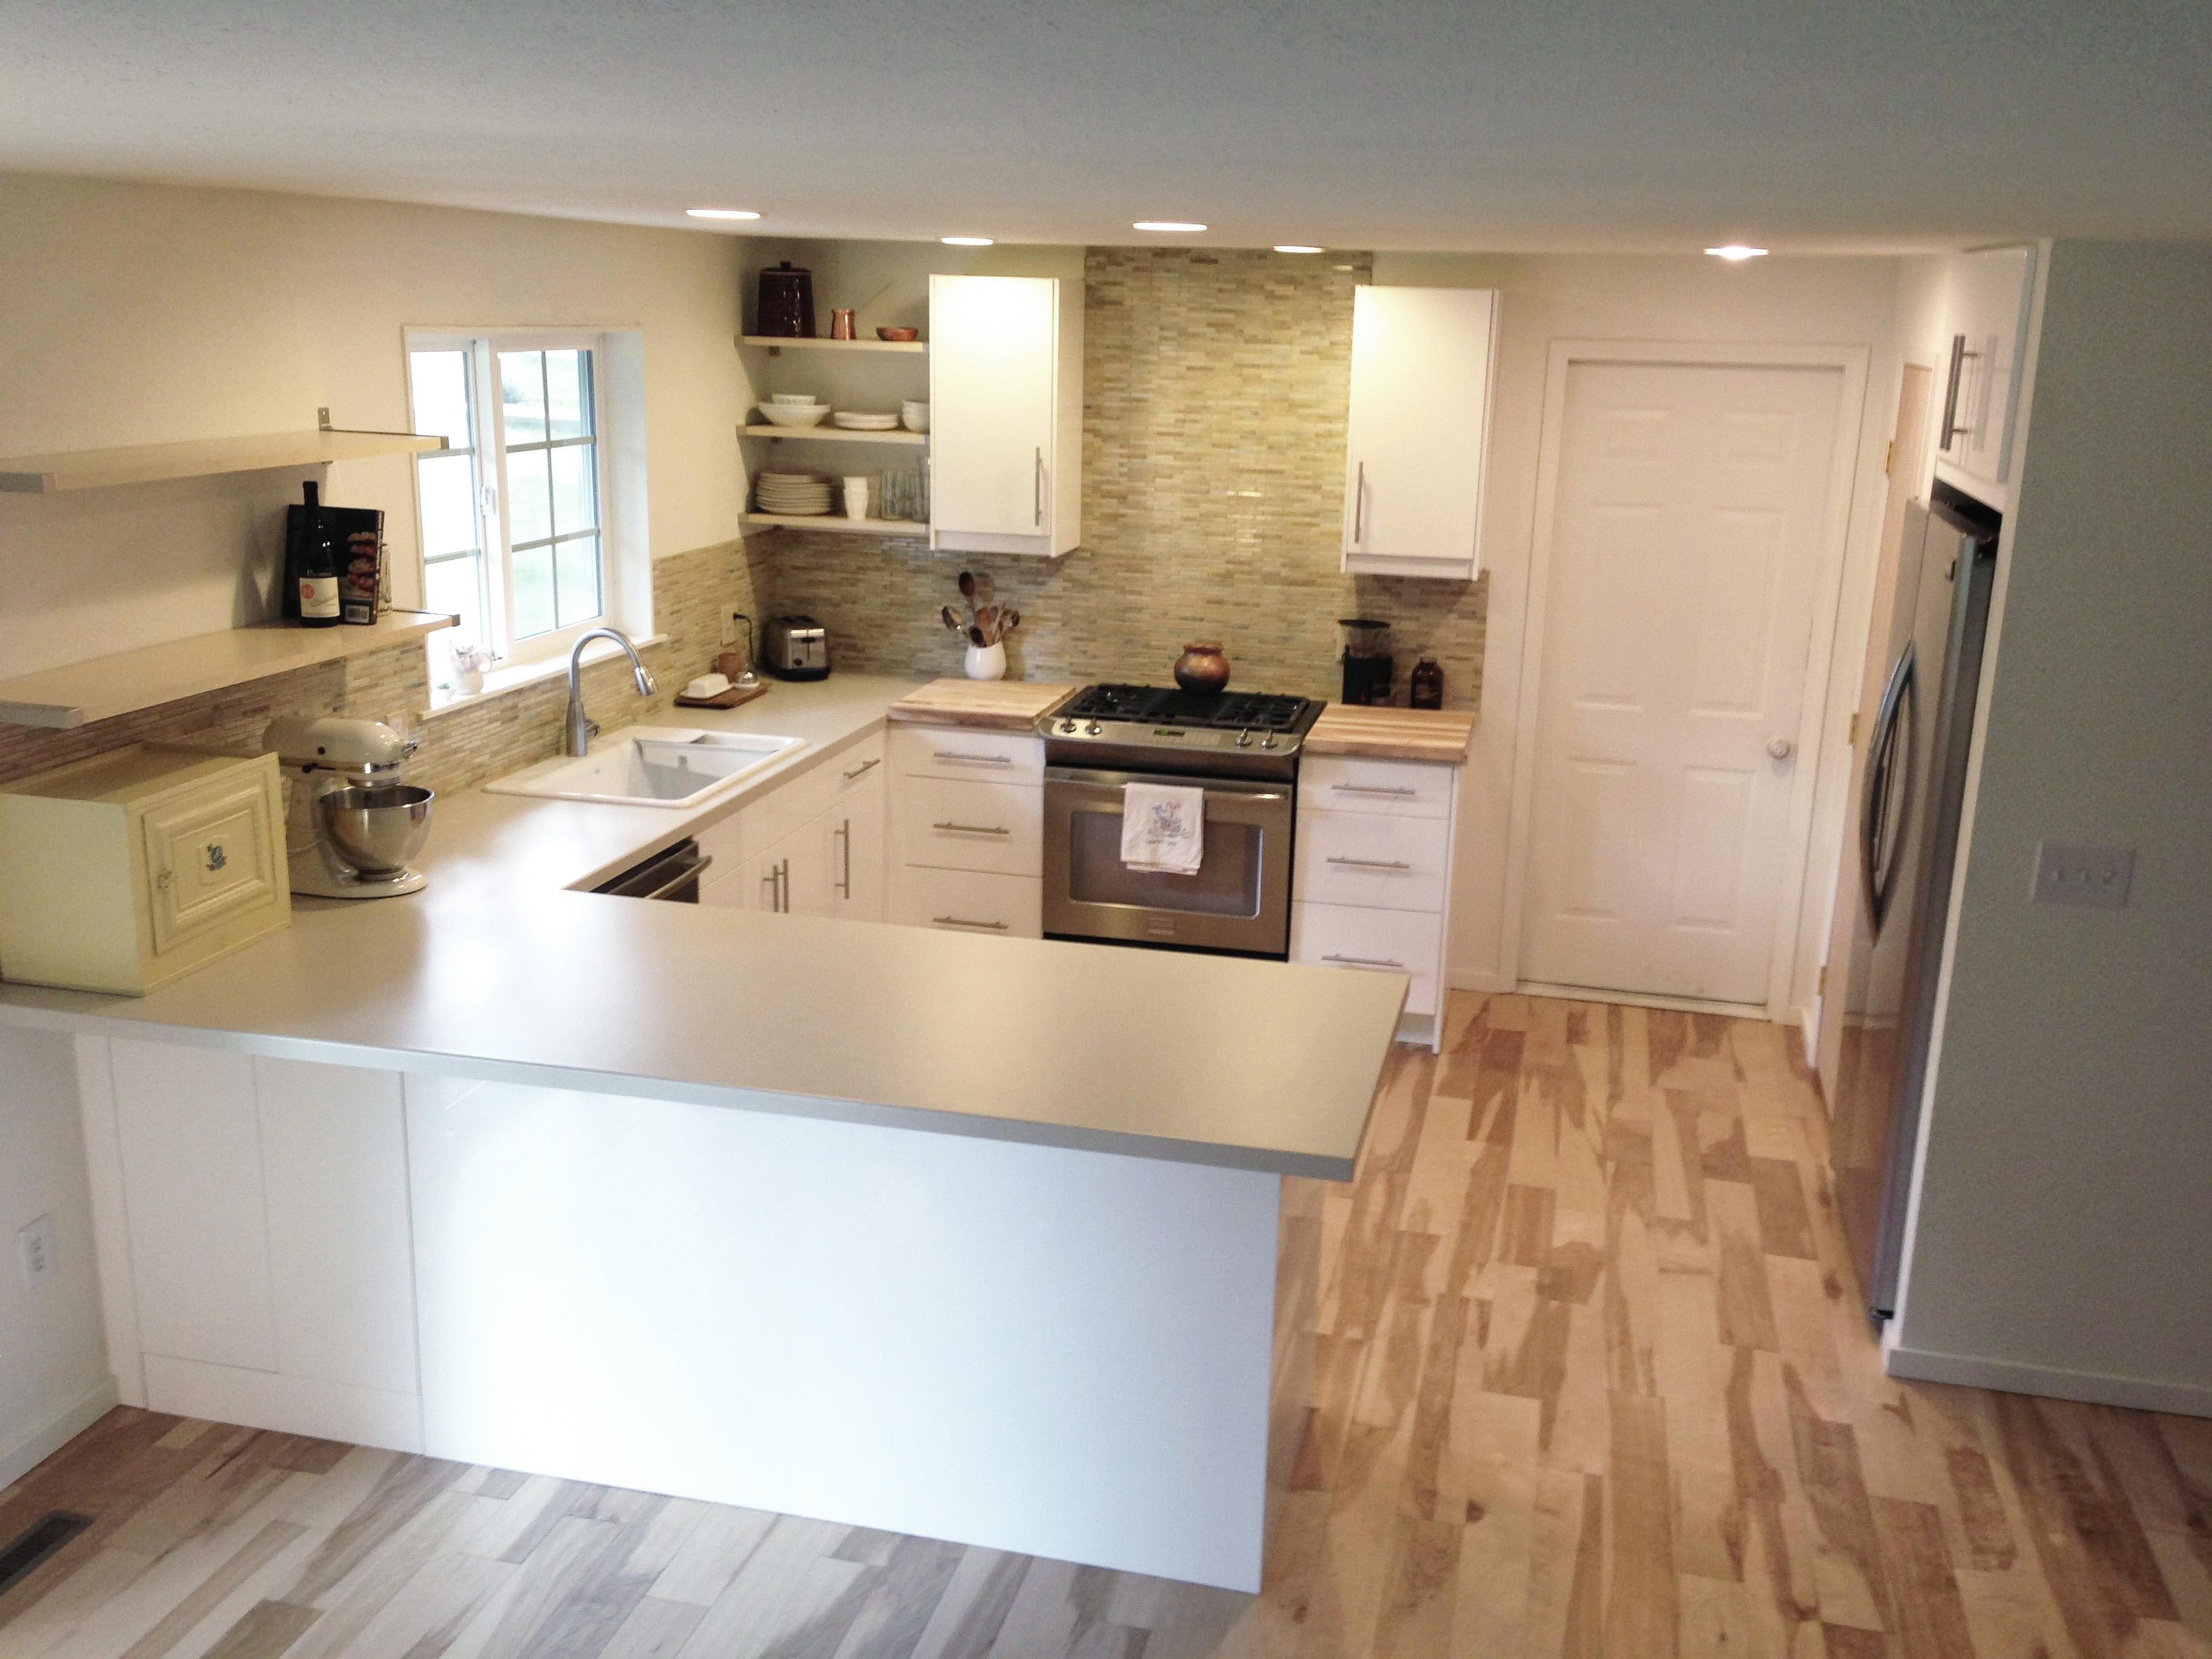 ikea kitchen diy ikea kitchen remodel ranch kitchen remodel